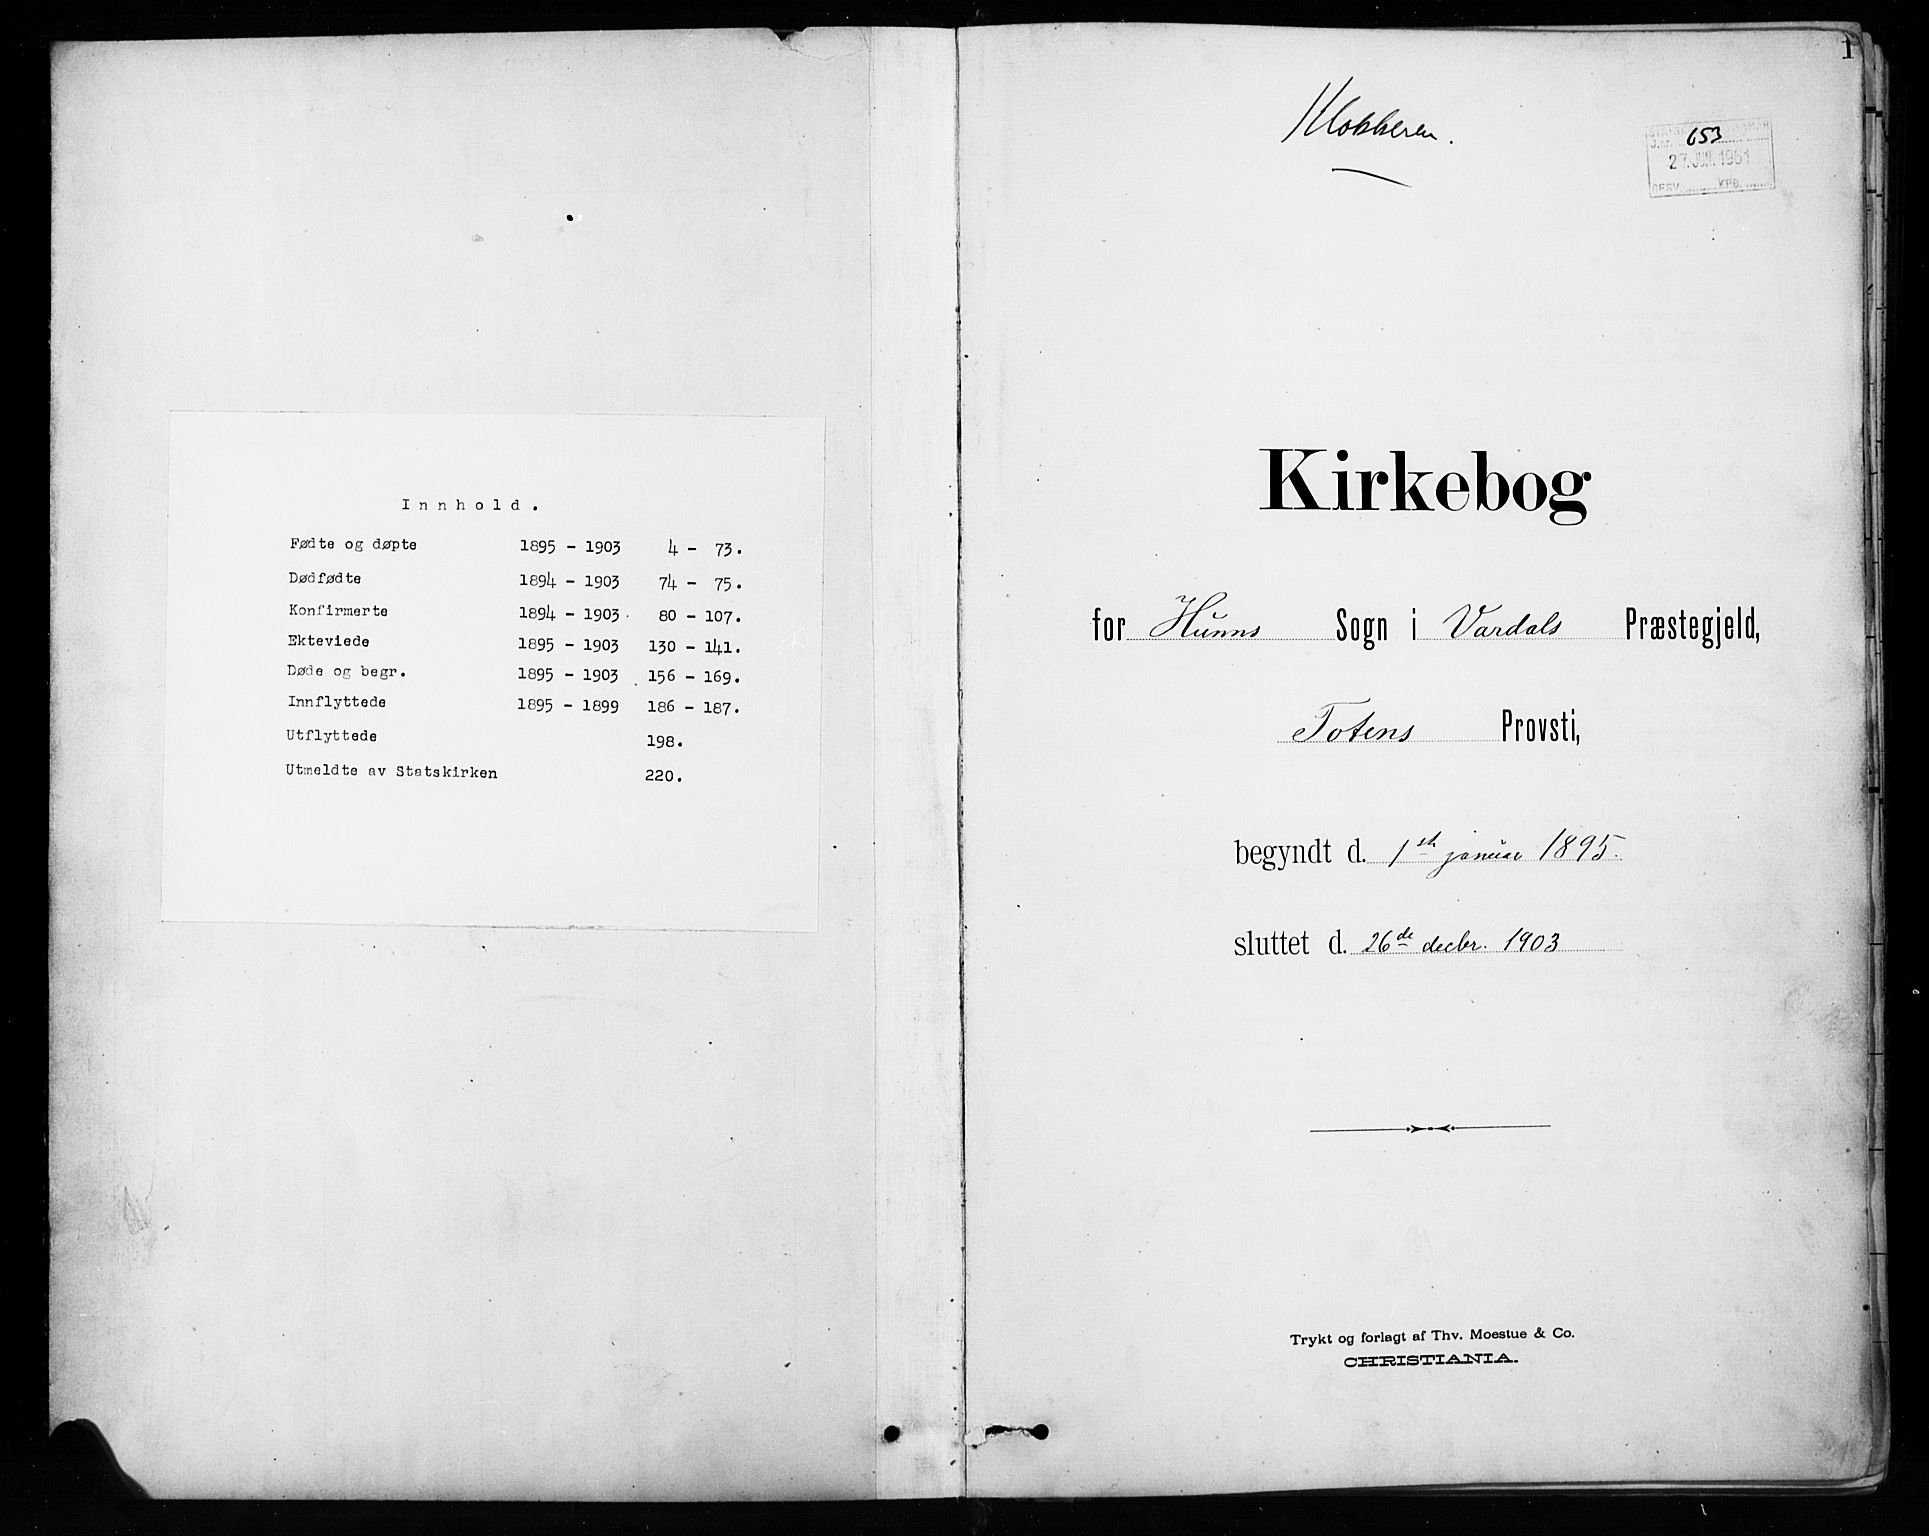 SAH, Vardal prestekontor, H/Ha/Hab/L0010: Klokkerbok nr. 10, 1895-1903, s. 1